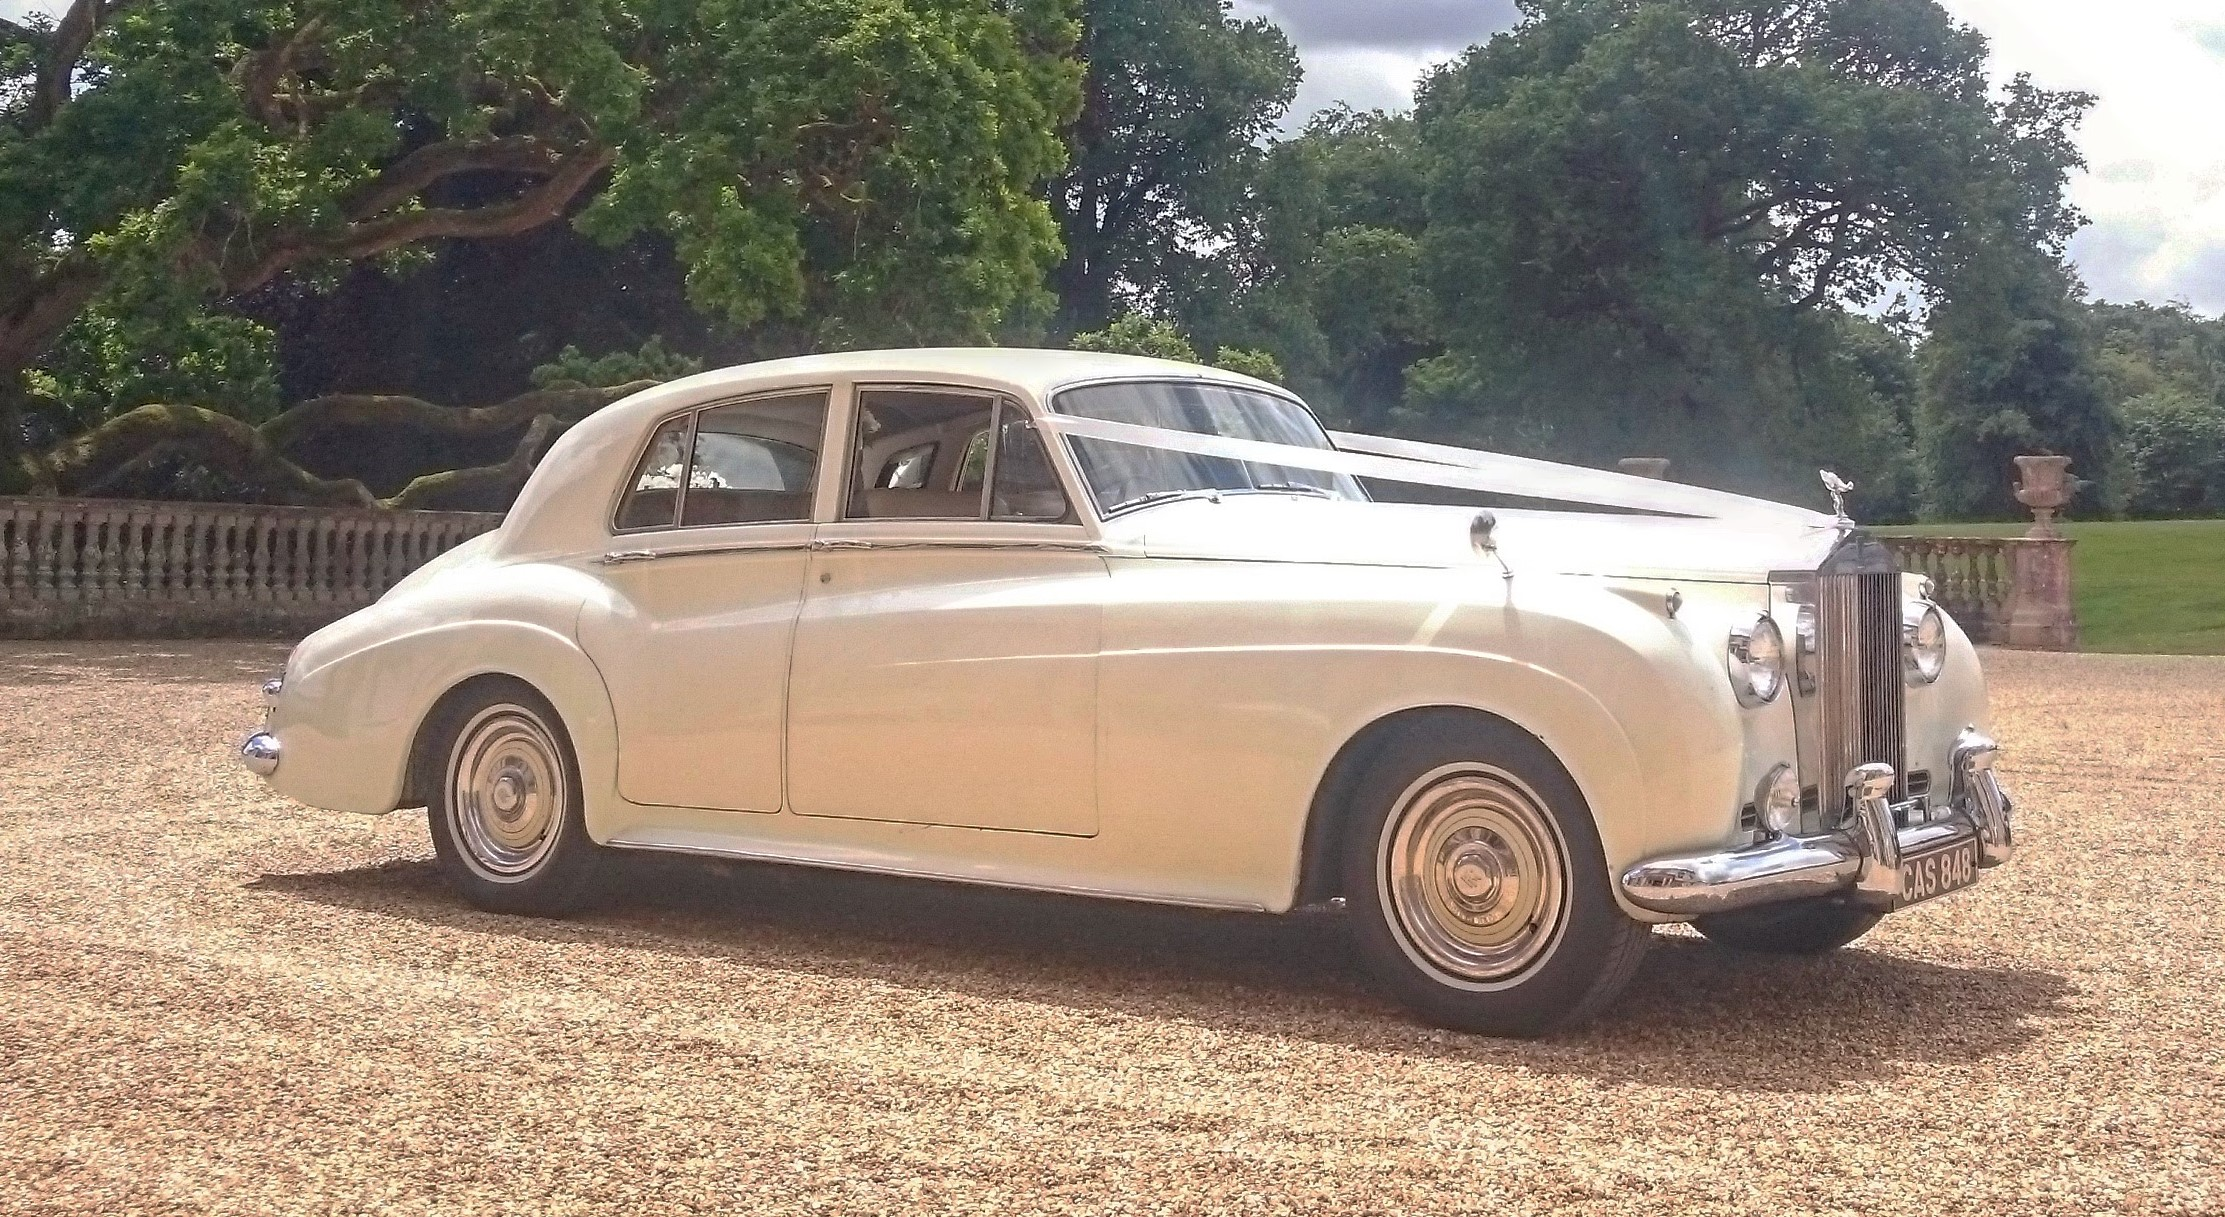 Classic-Car-Hire-Rolls-Royce-Silver-Cloud-1961-Hampton-Court (2).jpg